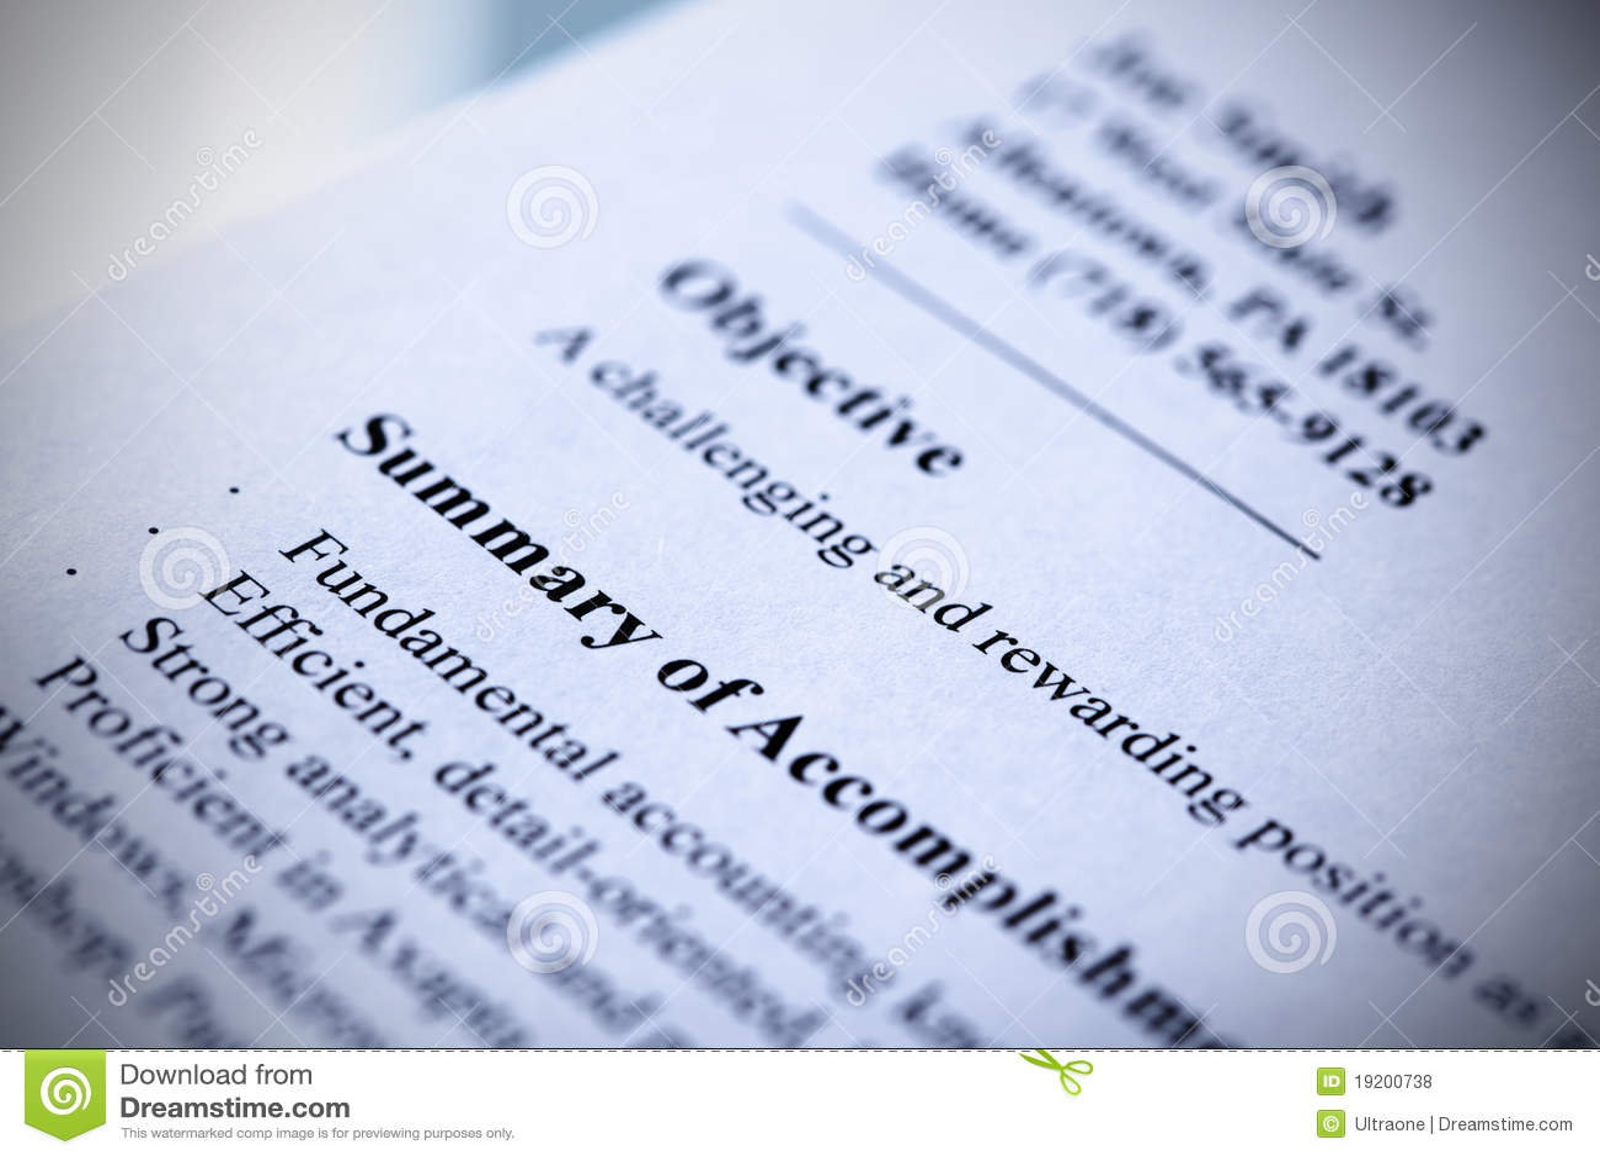 Modern resume close-up. stock photo. Image of tint, resume - 19200738